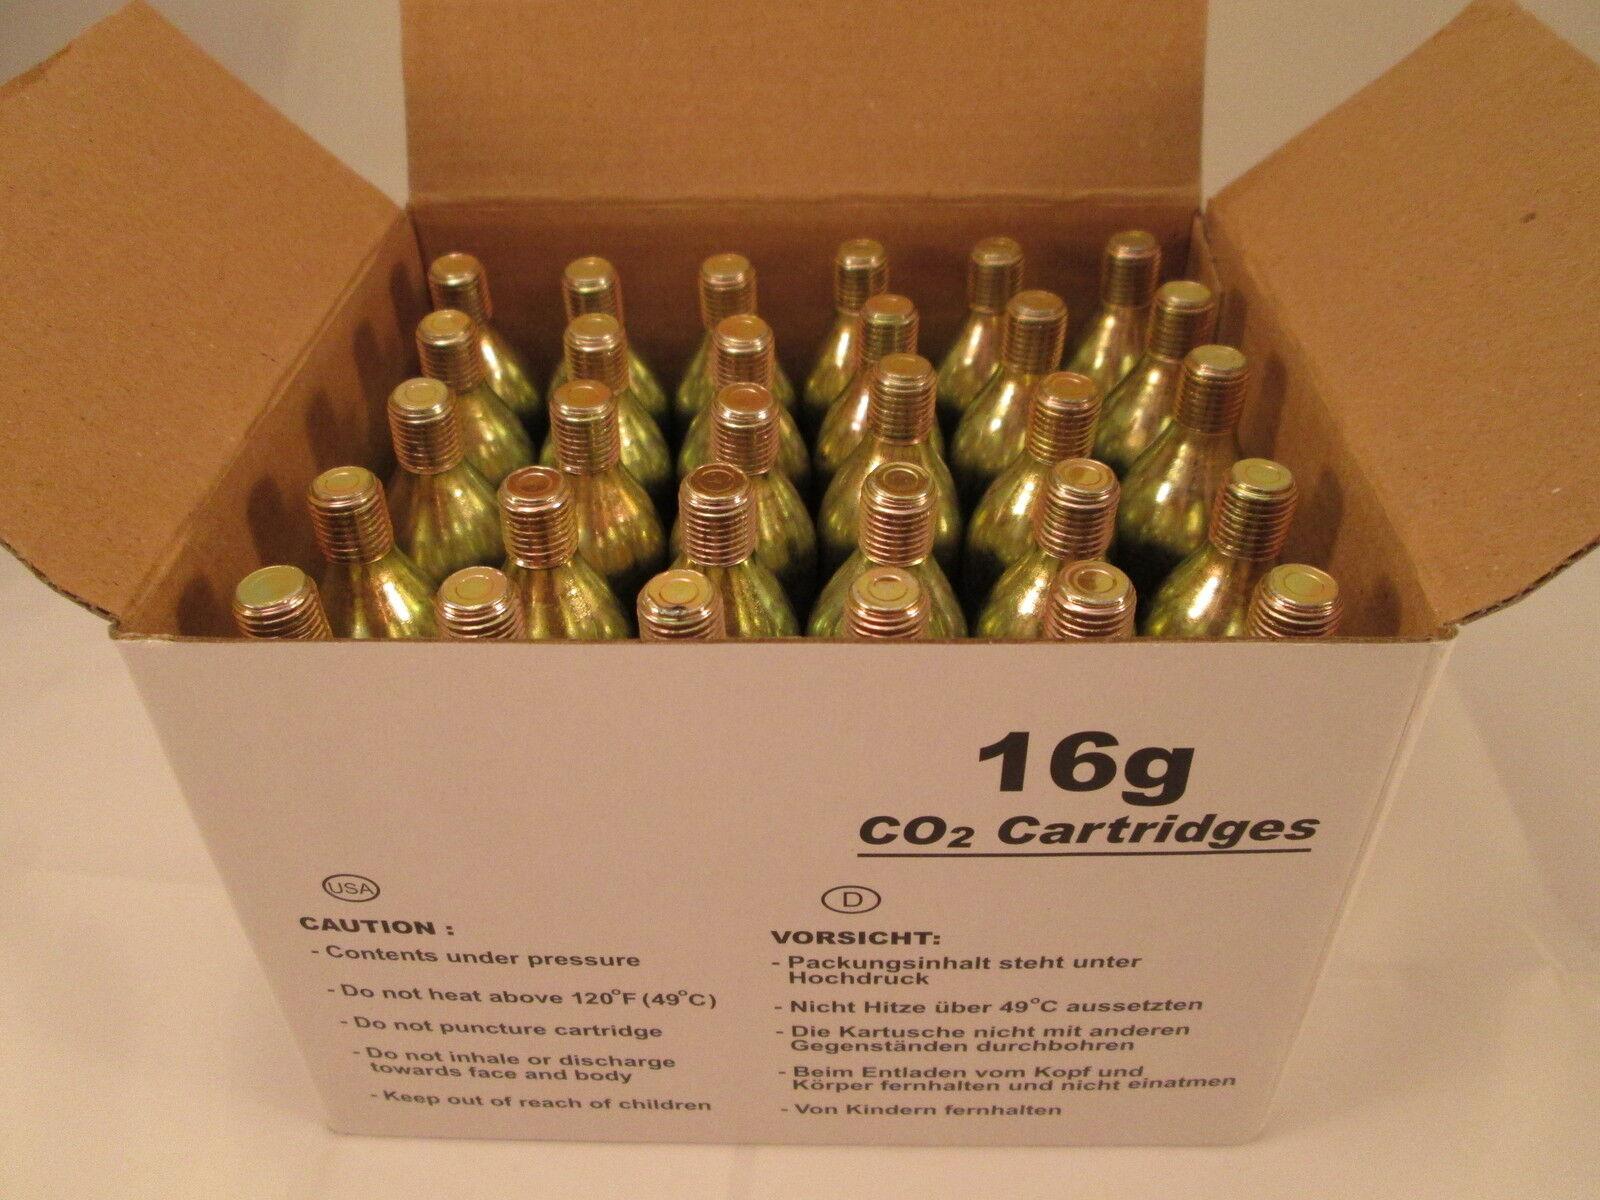 300 CO2 cartridge 16g Threaded C02  BIKE    motorcycle TIRE inflator 16 gram HVAC  sale online discount low price